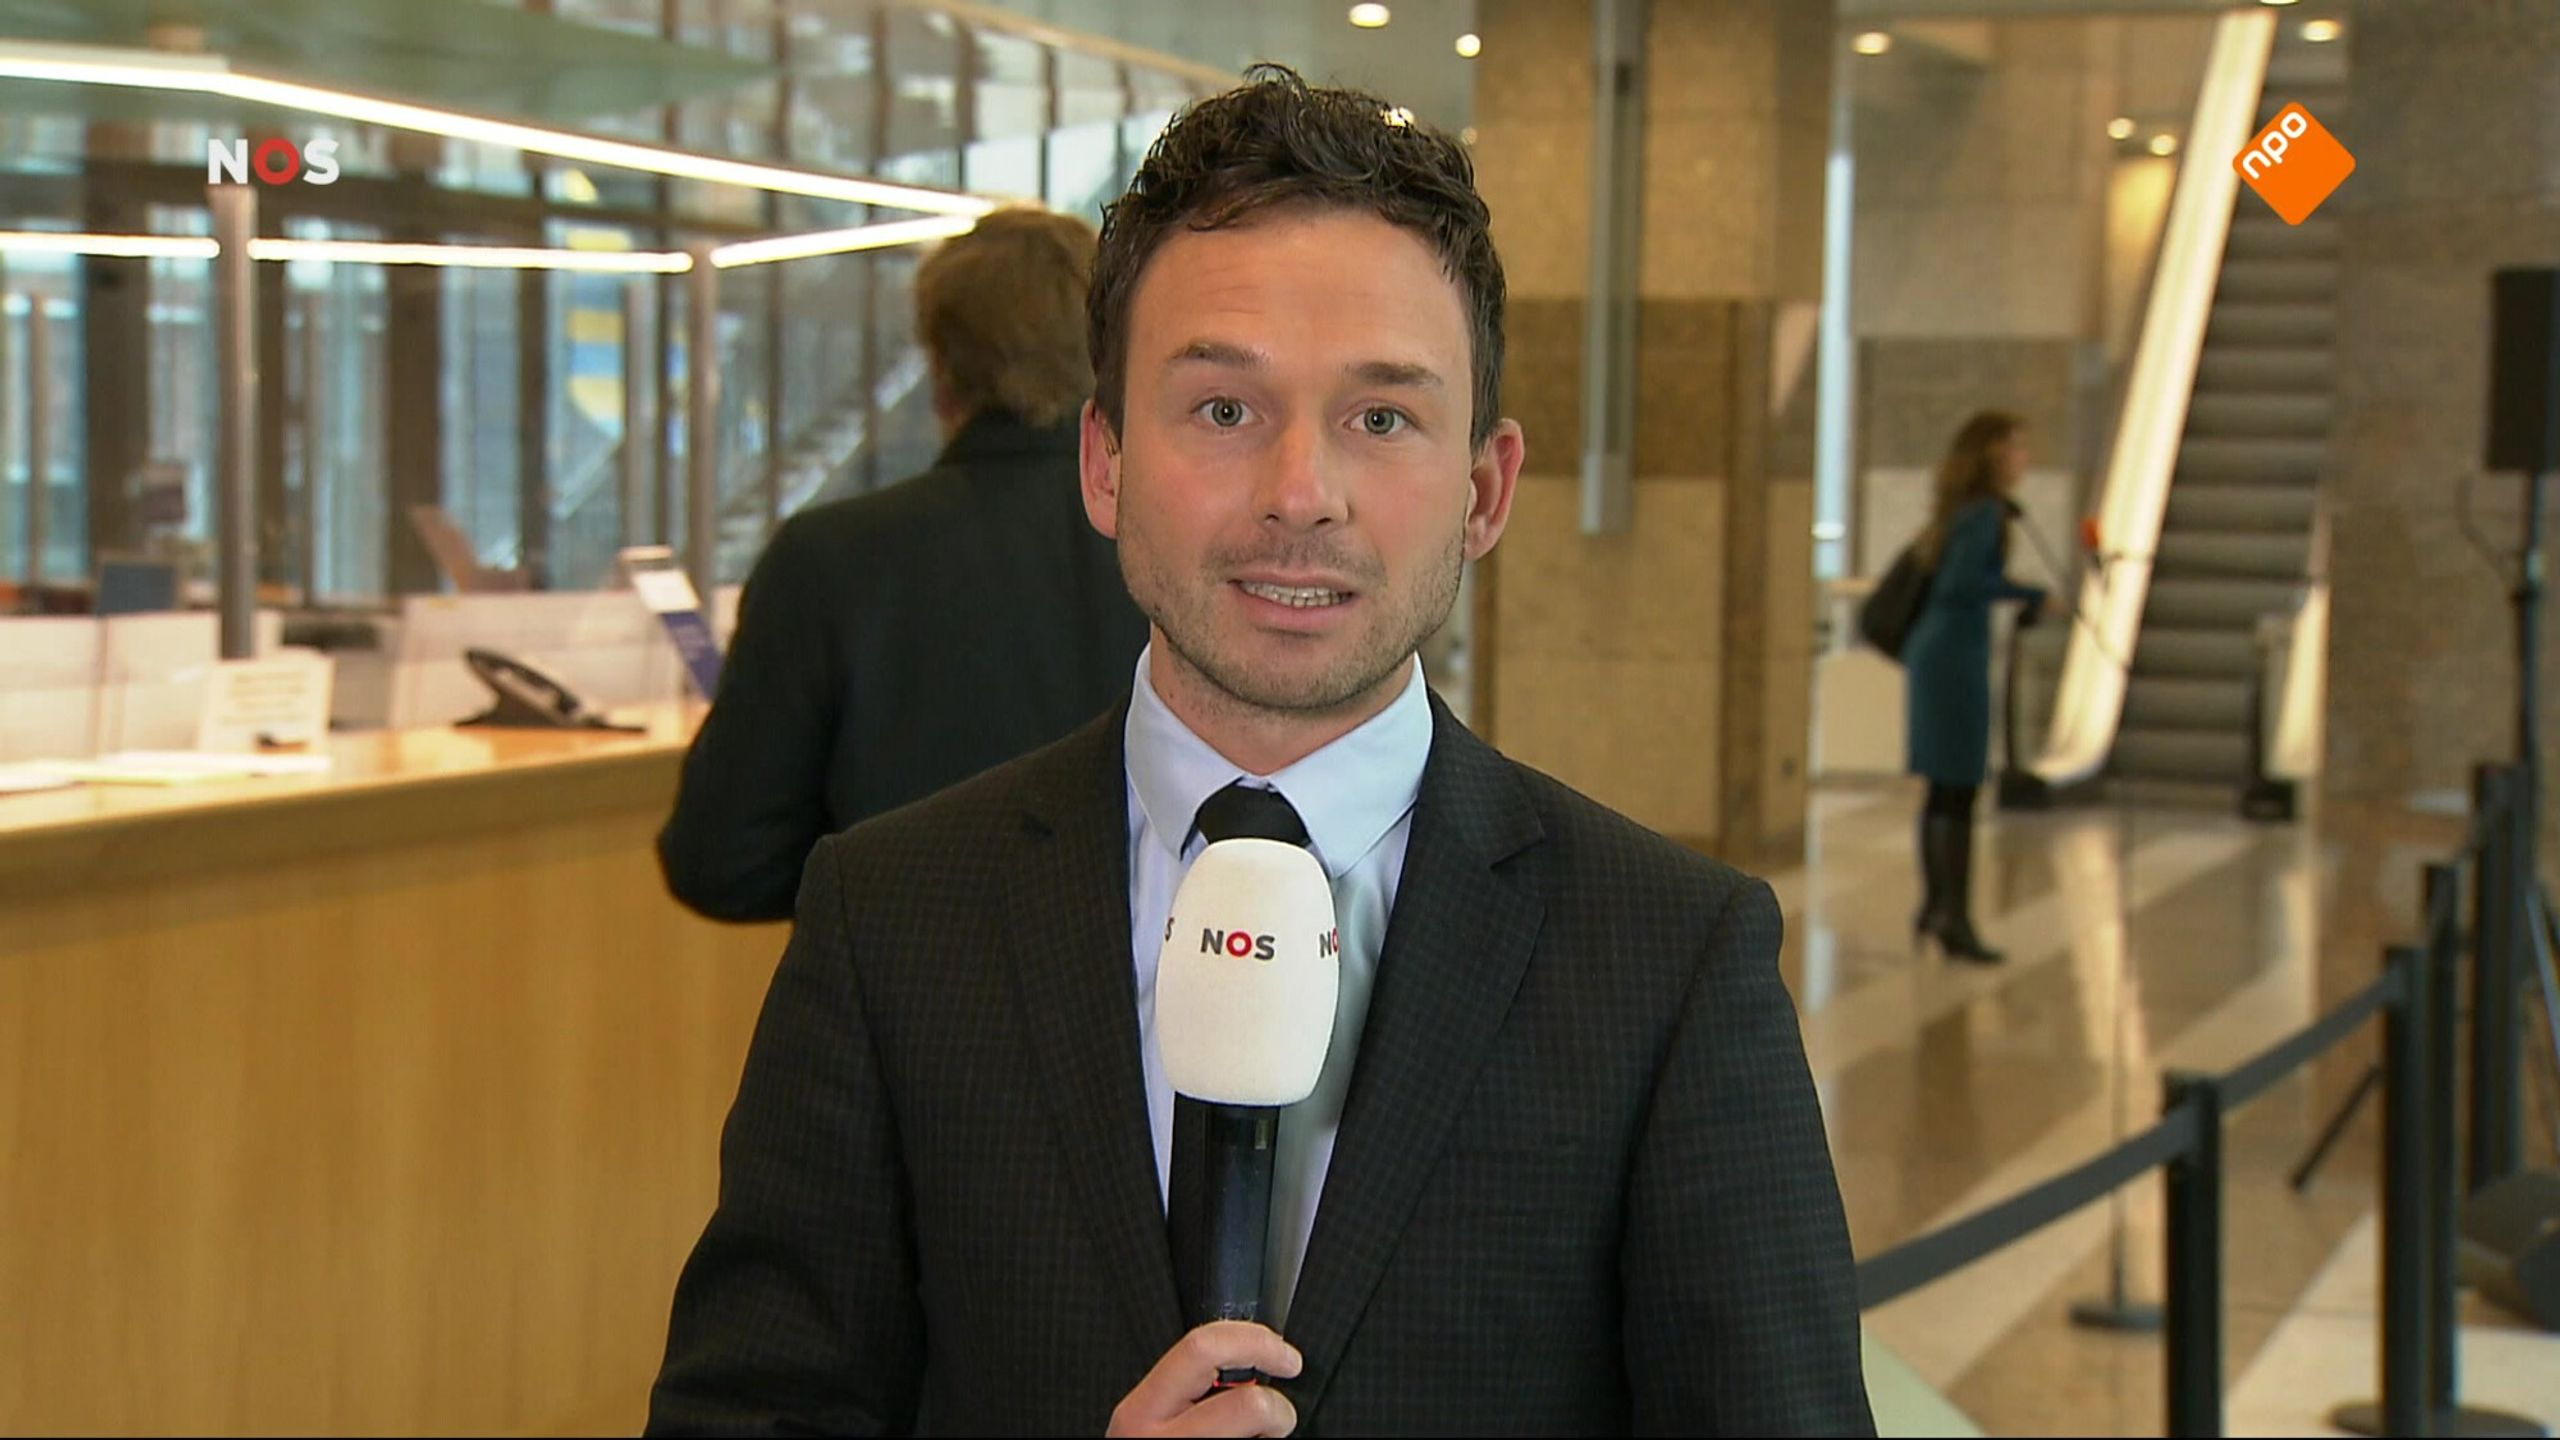 NOS Kamerdebat rellen in Nederland